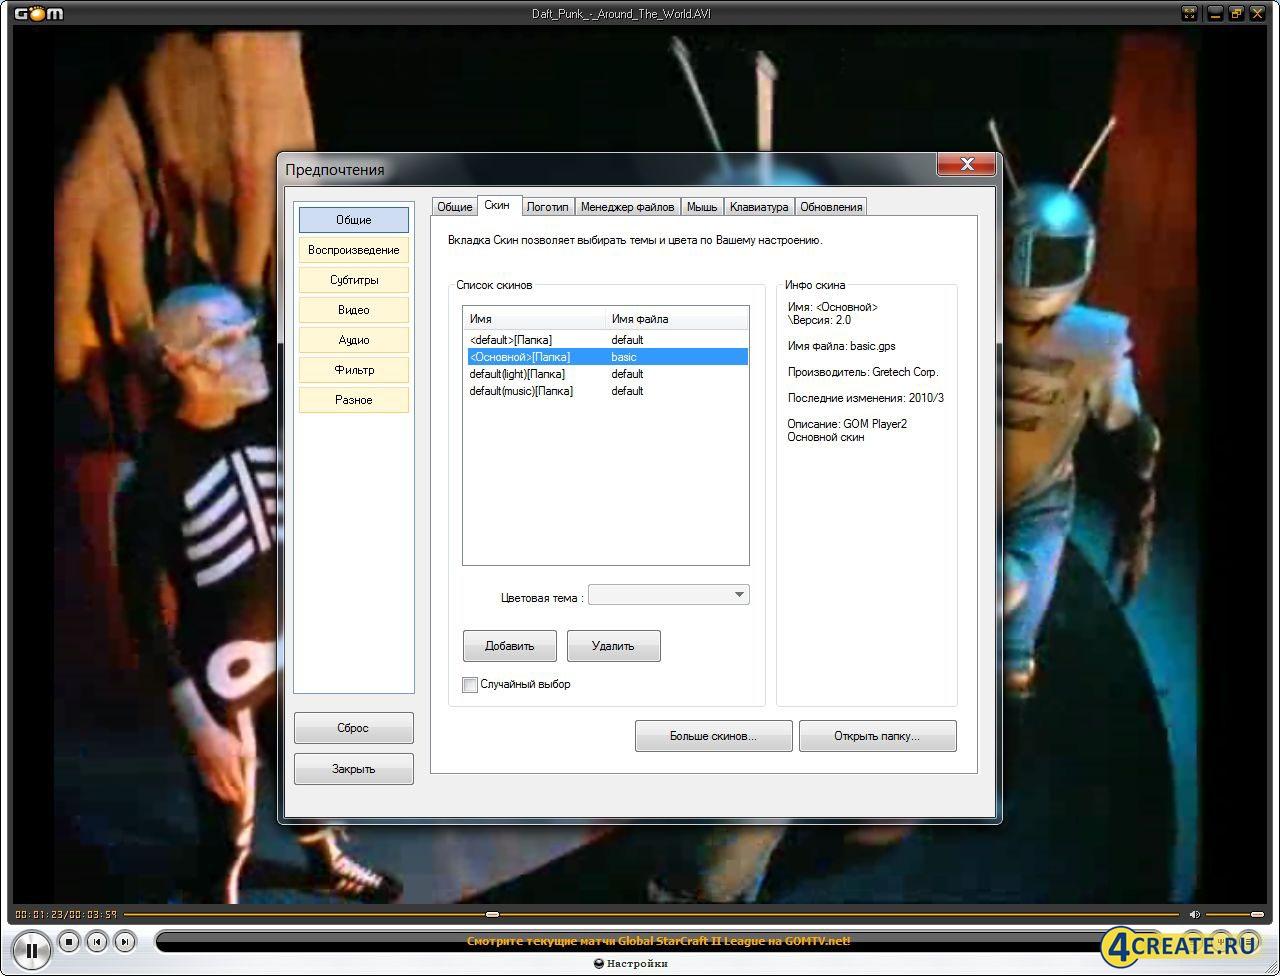 GOM Player 2.2.77.5240 (Скриншот 2)